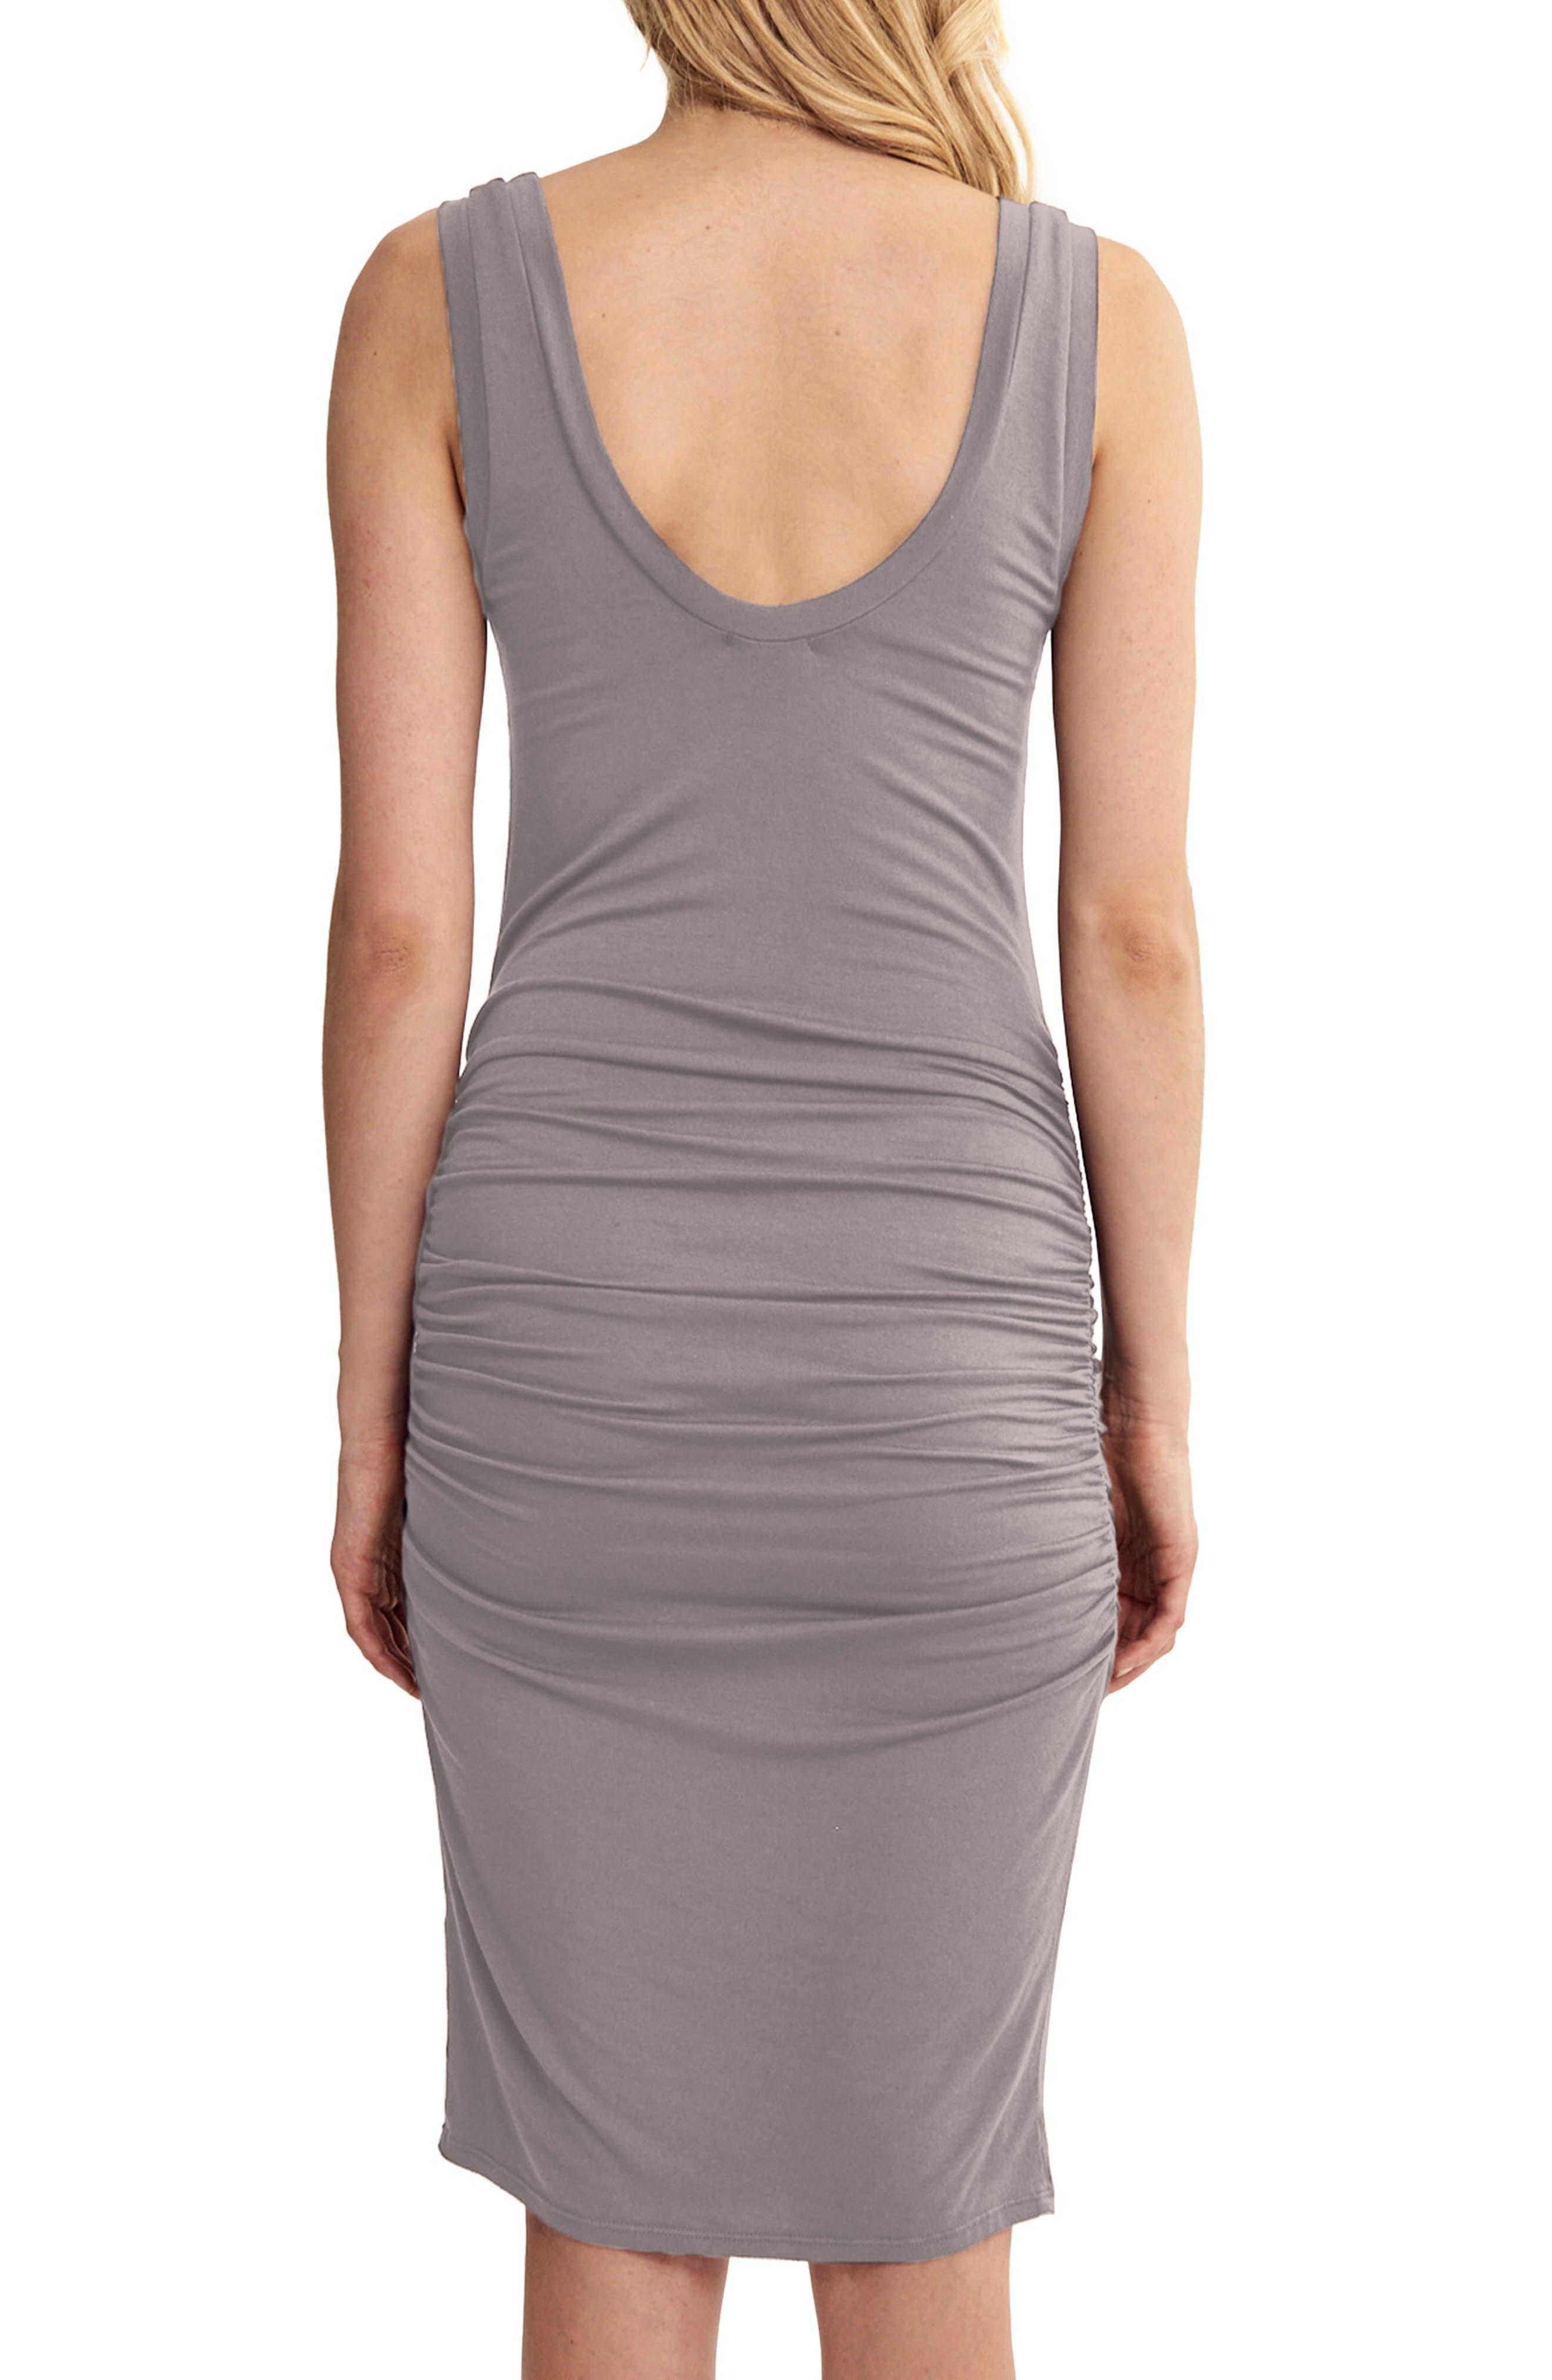 Alternate Image 2  - LAmade 'Frankie' Ruched Tank Dress